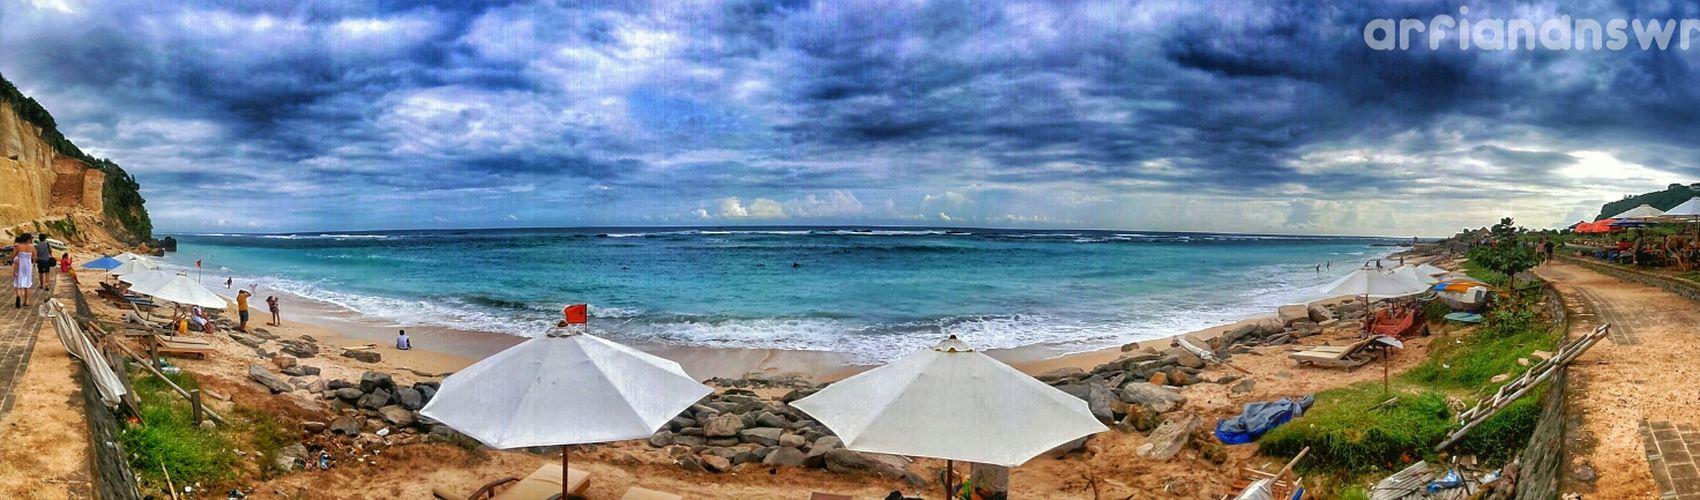 Life Is A Beach Panorama HDR Streamzoo